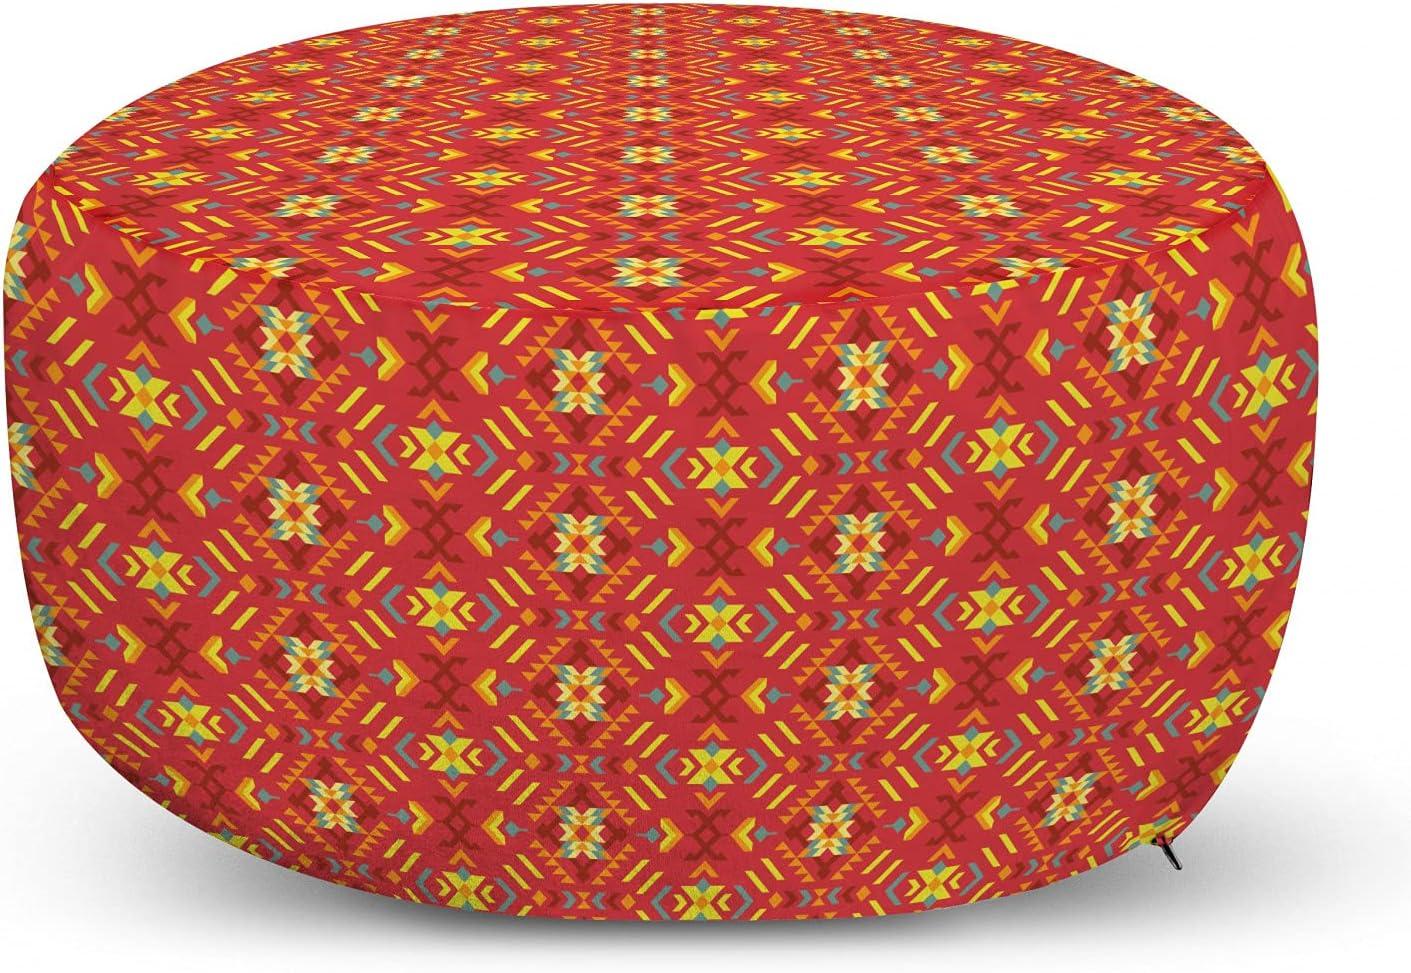 Lunarable Aztec Boho Ottoman Pouf Super Special Oakland Mall SALE held Triba Mayan Pattern Primitive